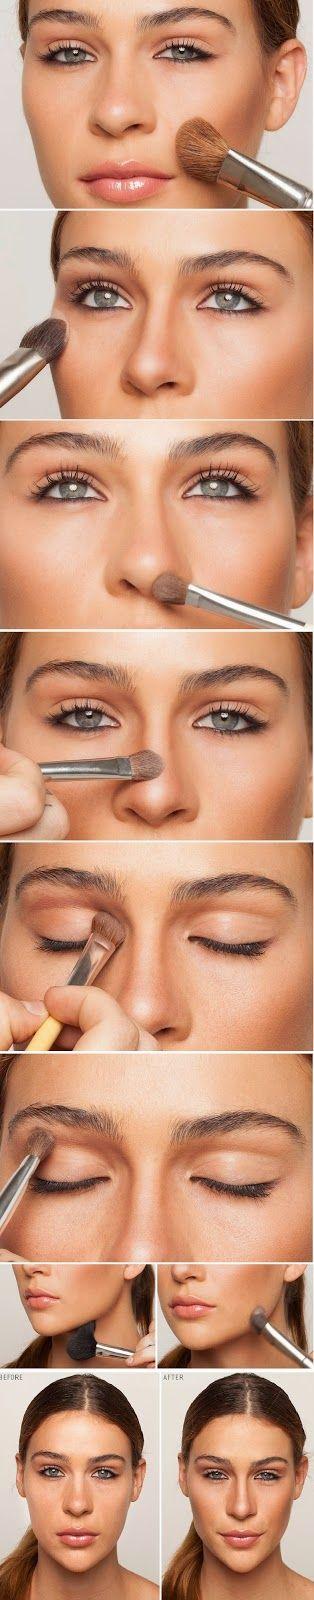 How to Contour : Basic Make-up Tutorials for Makeup Ideas